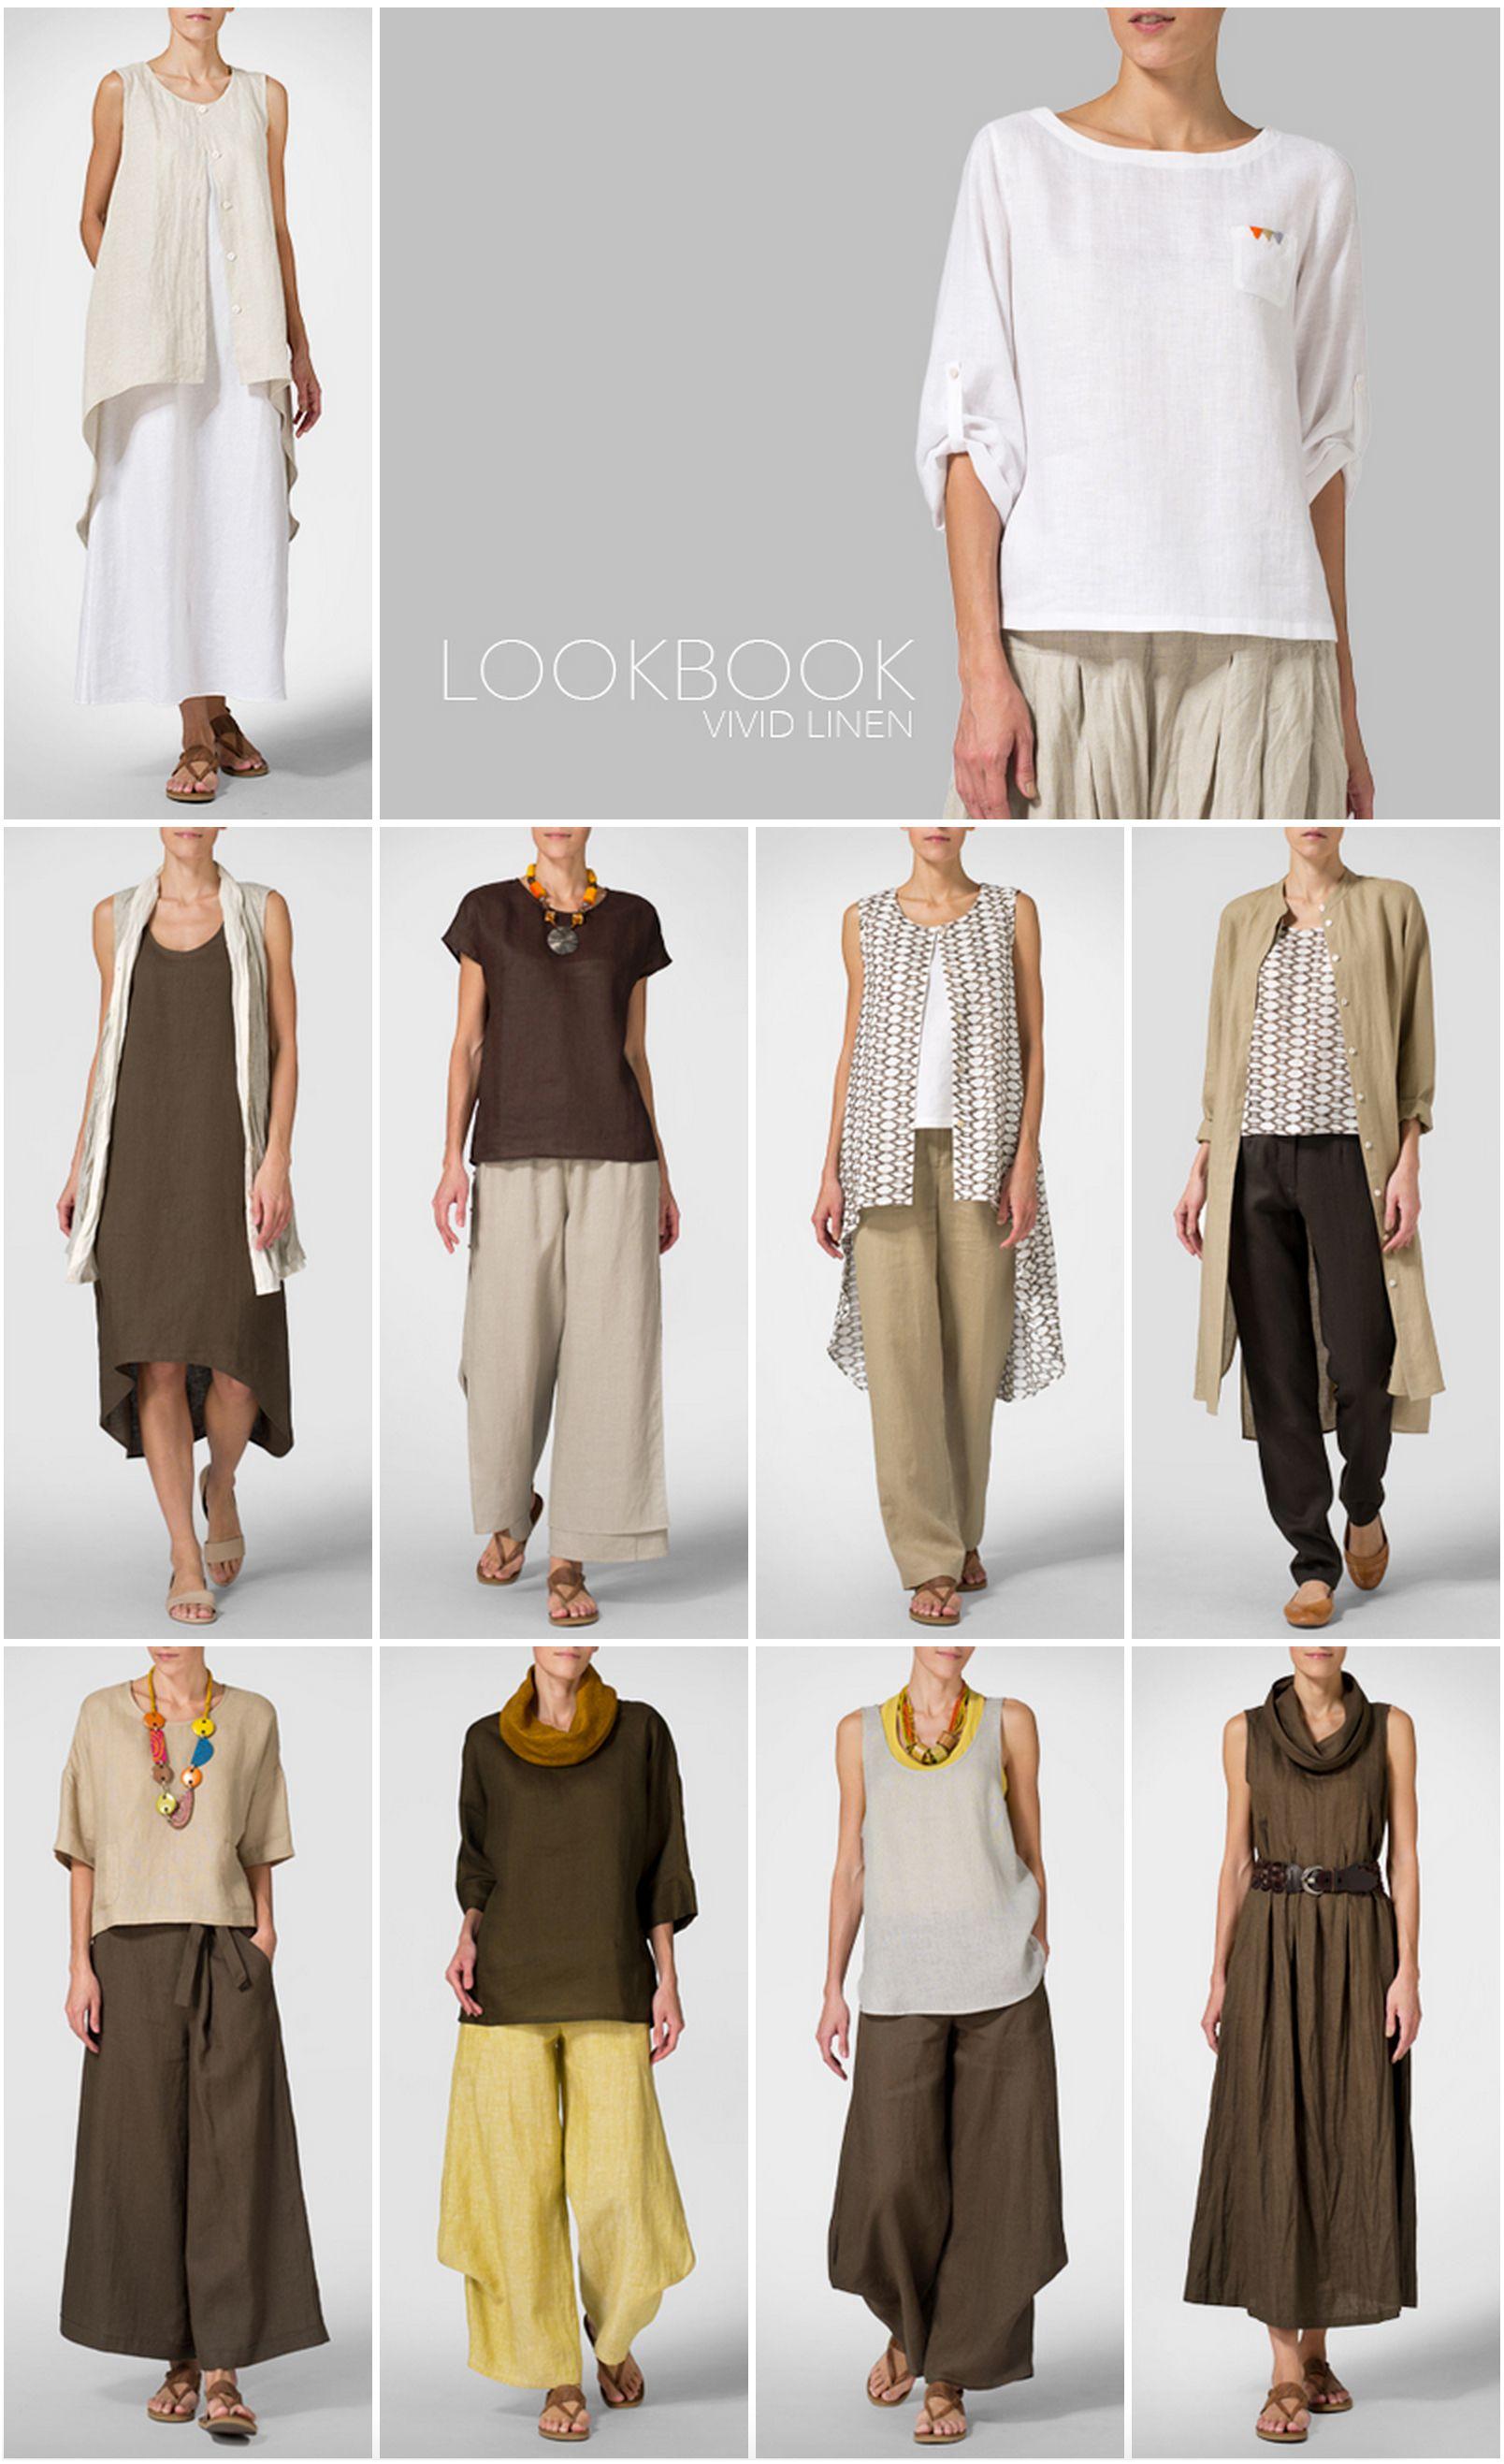 bbd9e4cd12 VIVID LINEN clothing - LOOKBOOK